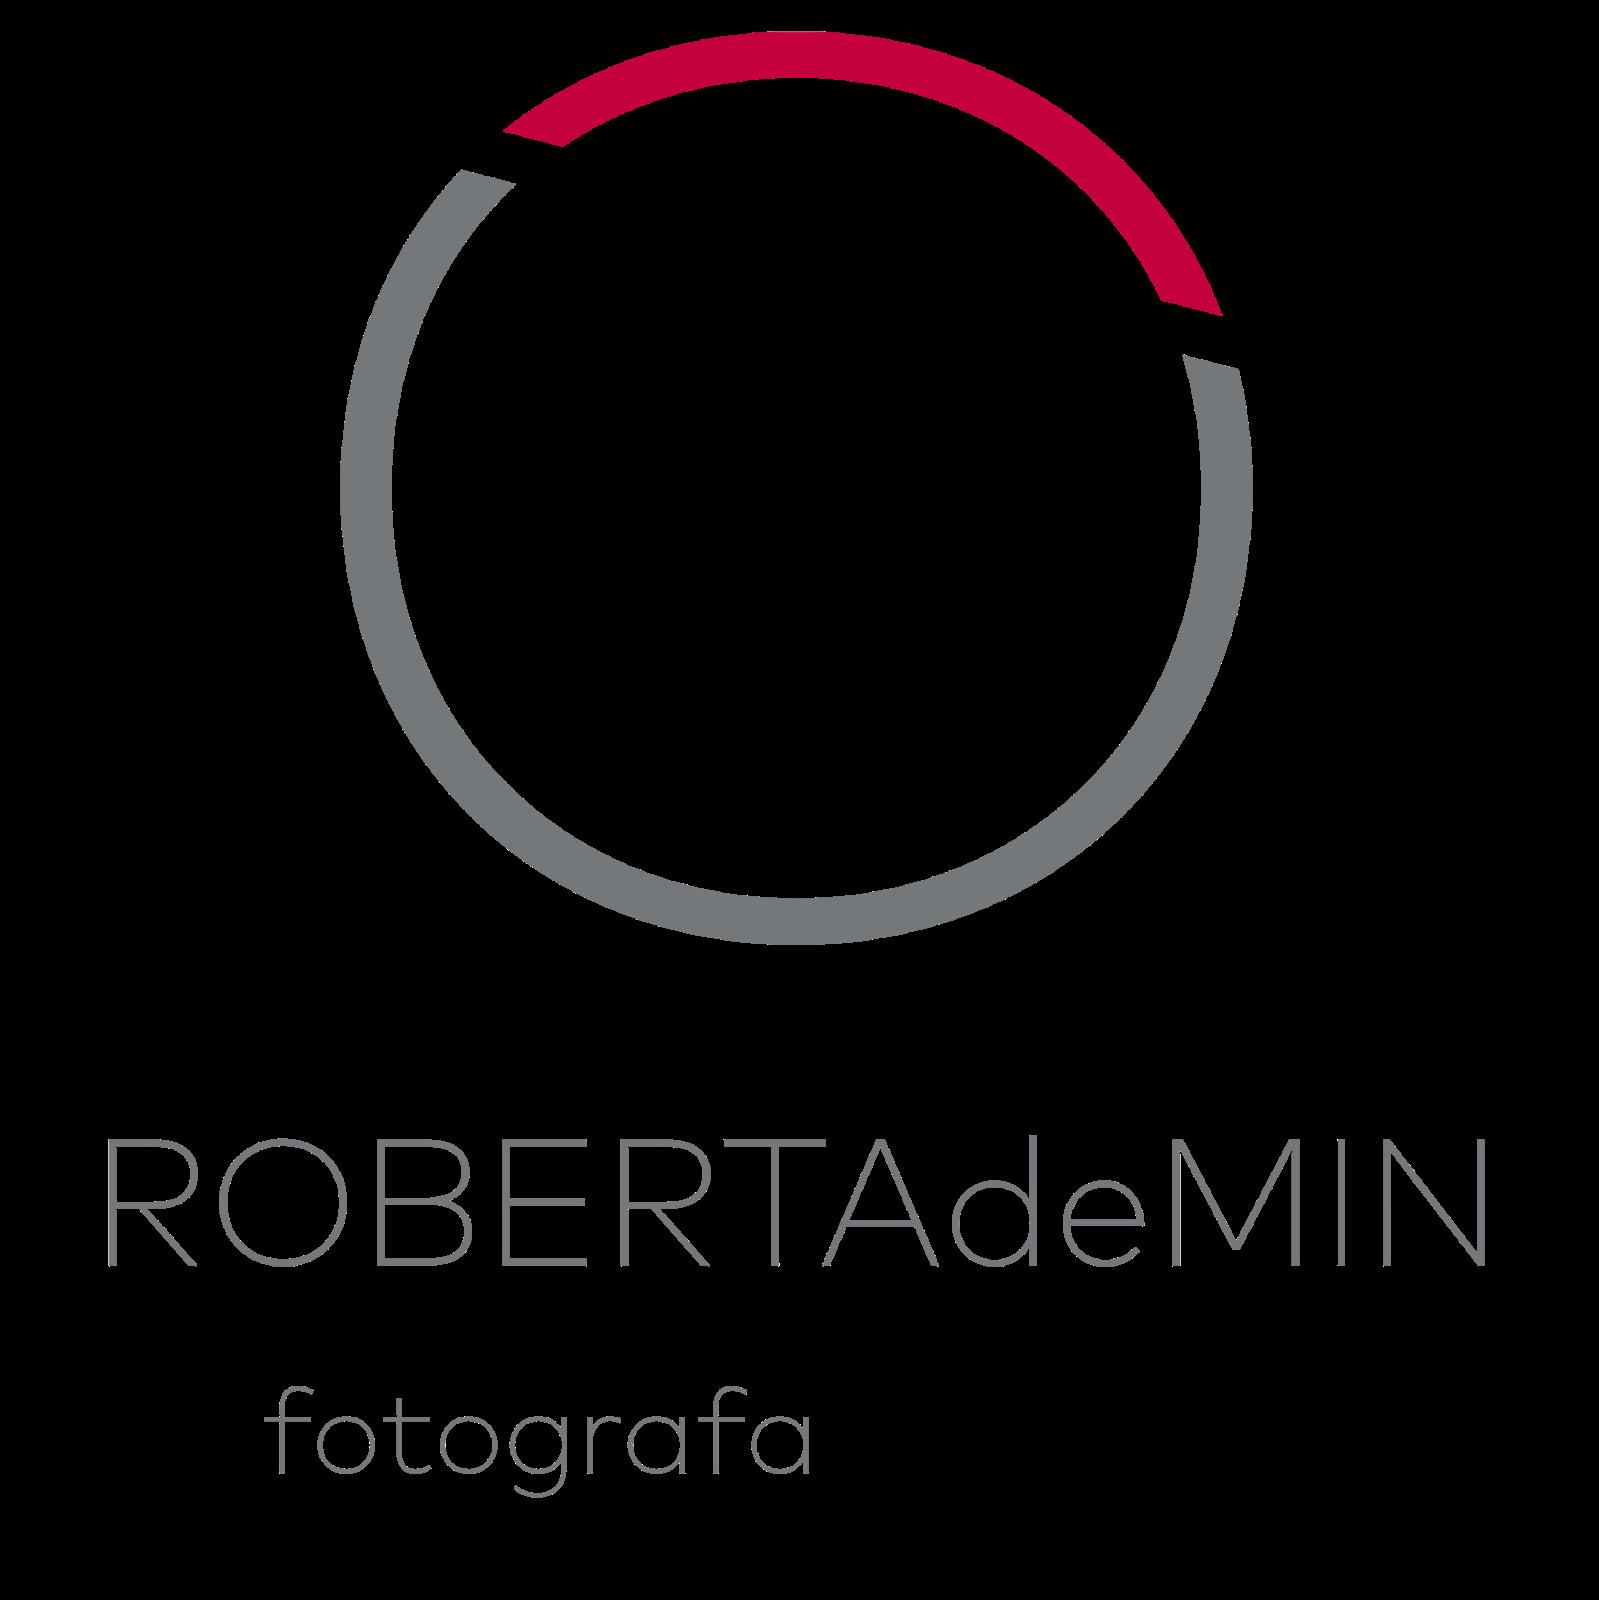 Roberta De Min Fotografa